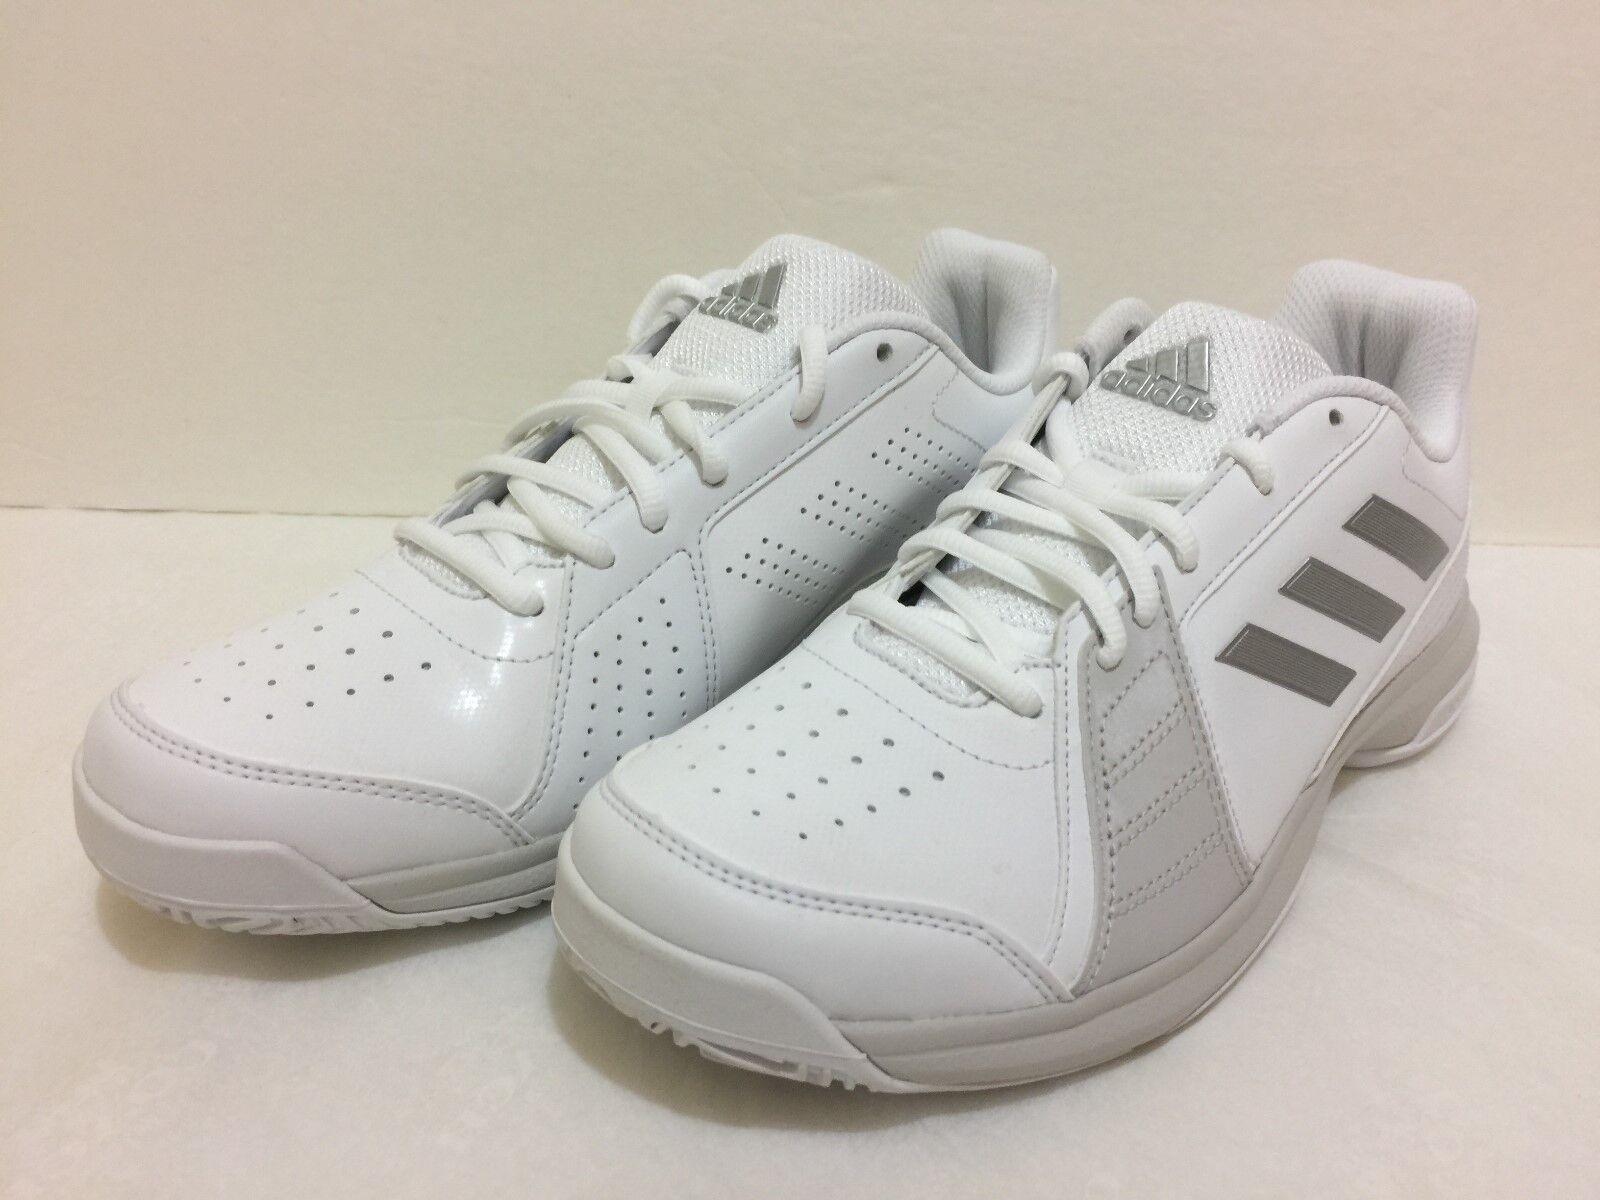 les nouvelles femmes baskets adidas aspirent baskets femmes taille 8,5 sku by1658 5 2a4b94